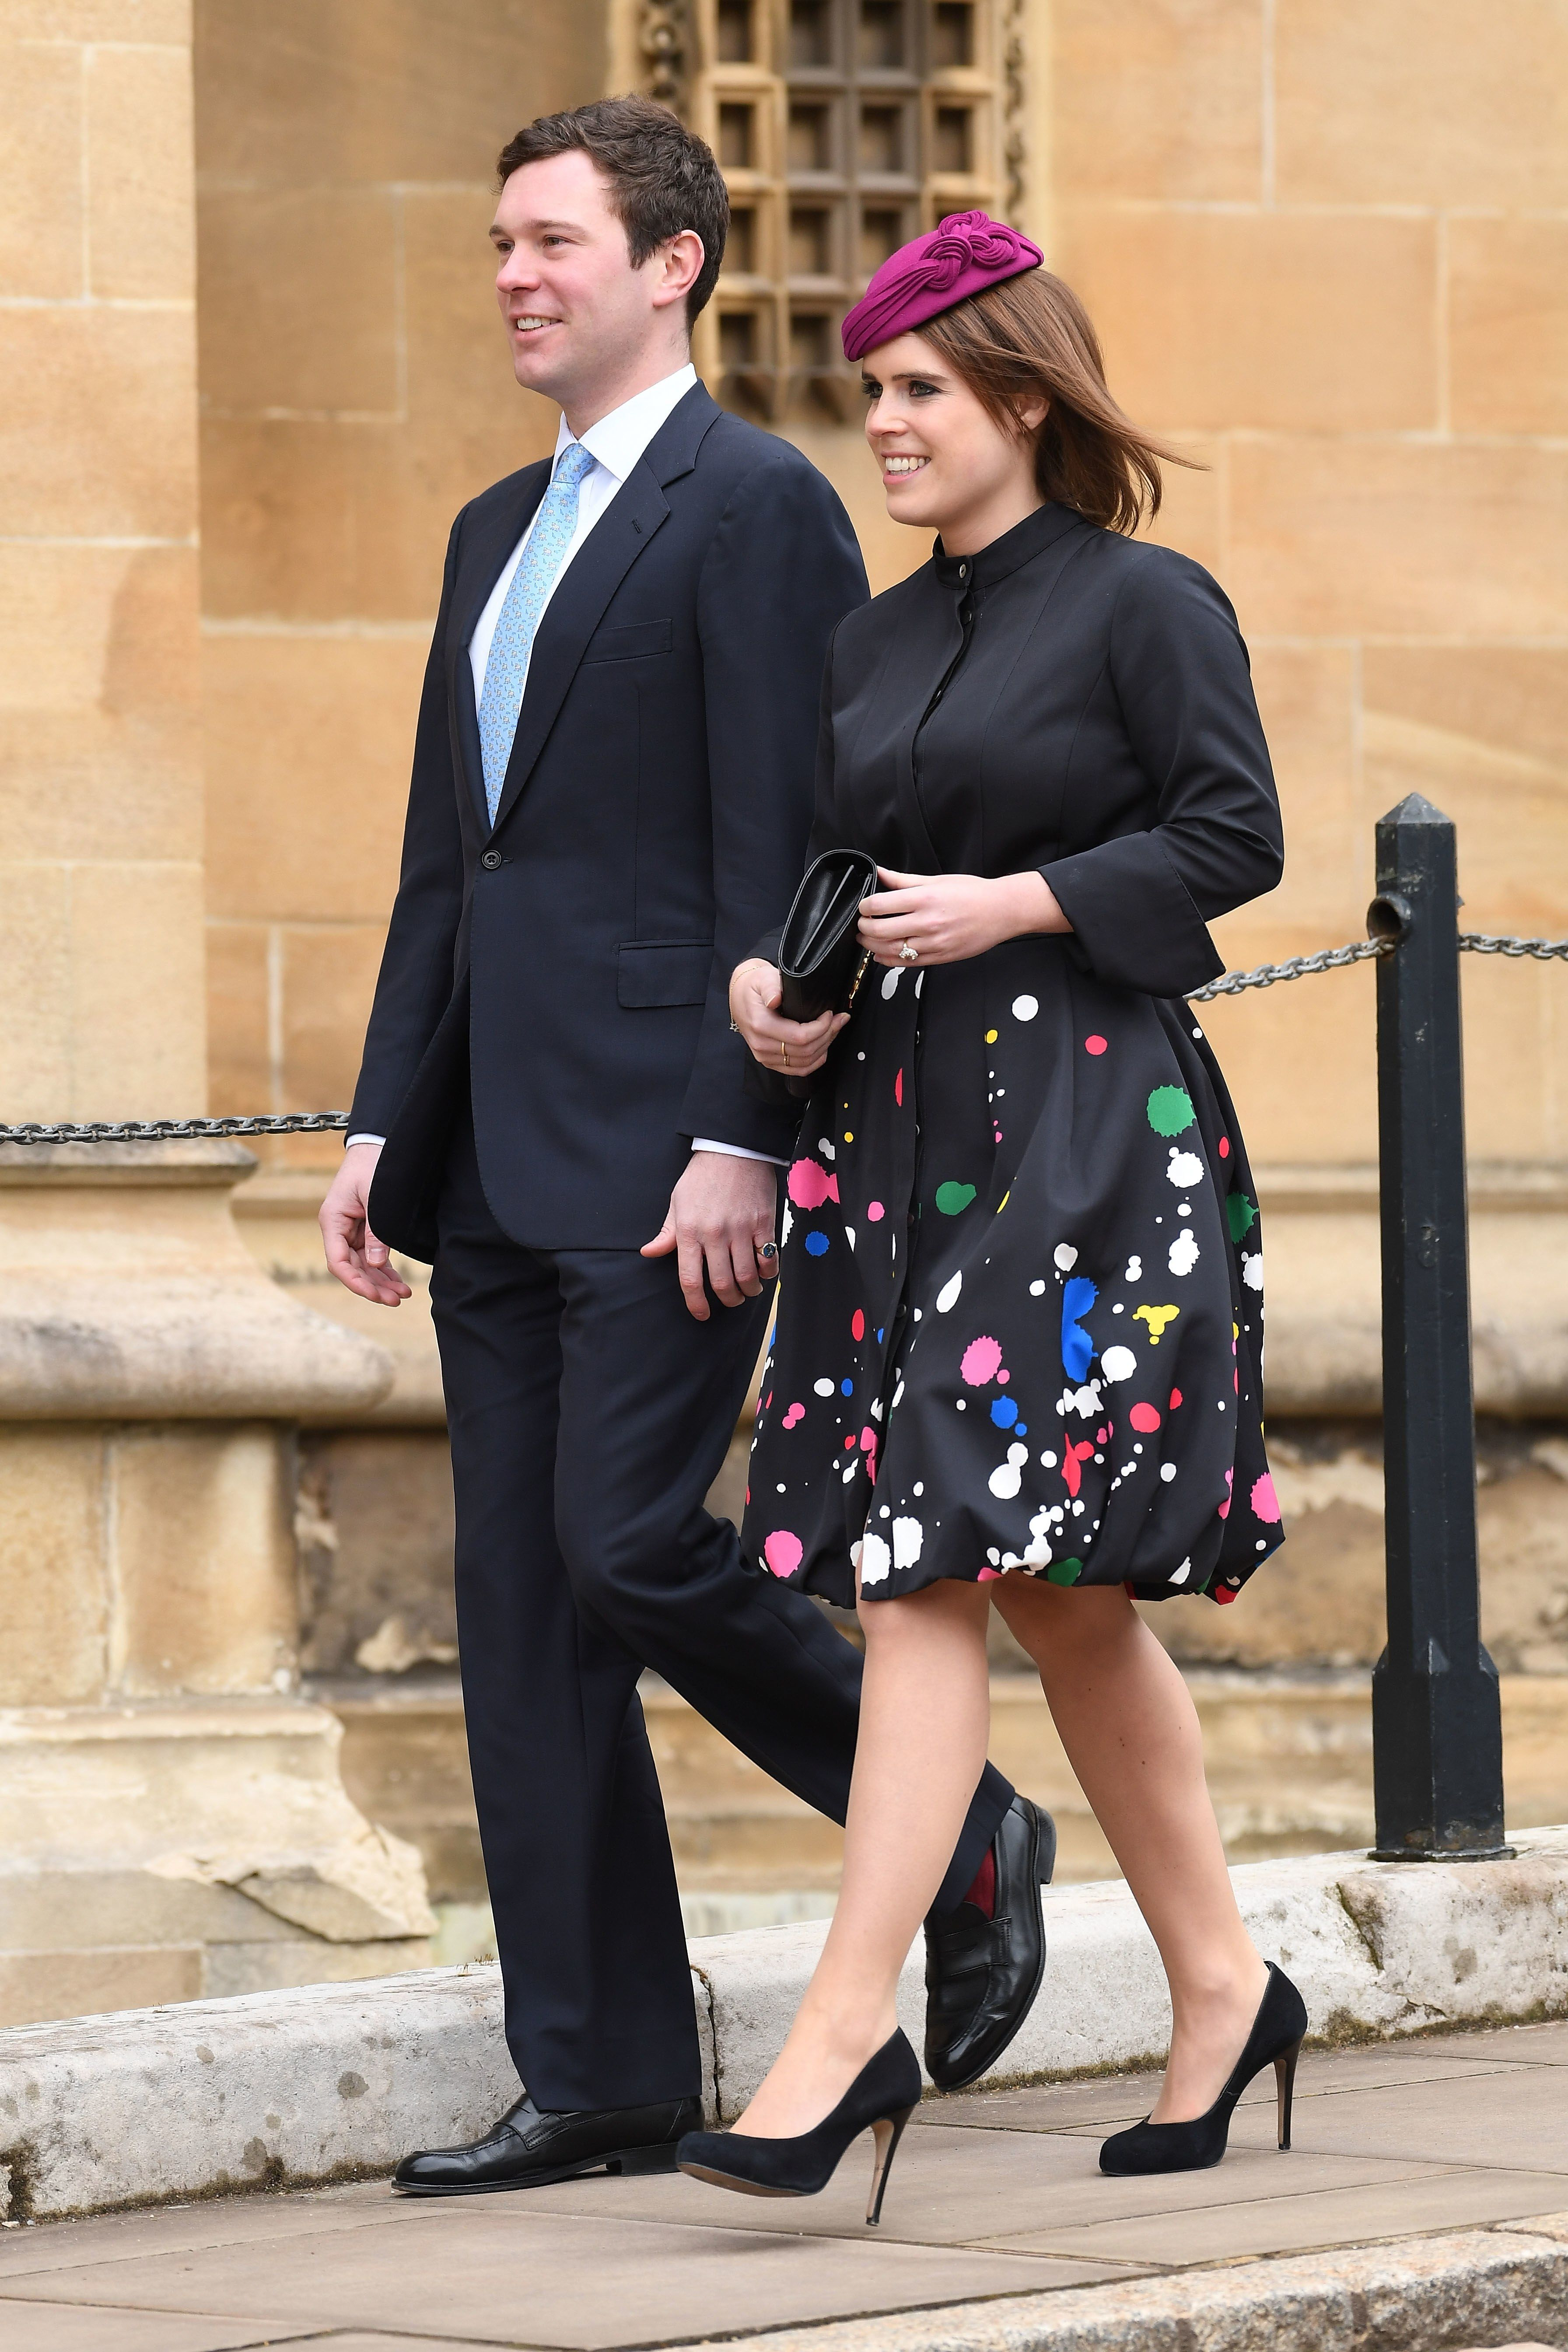 Wedding Video Award On Twitter Eugenie Wedding Princess Eugenie Princess Eugenie Jack Brooksbank